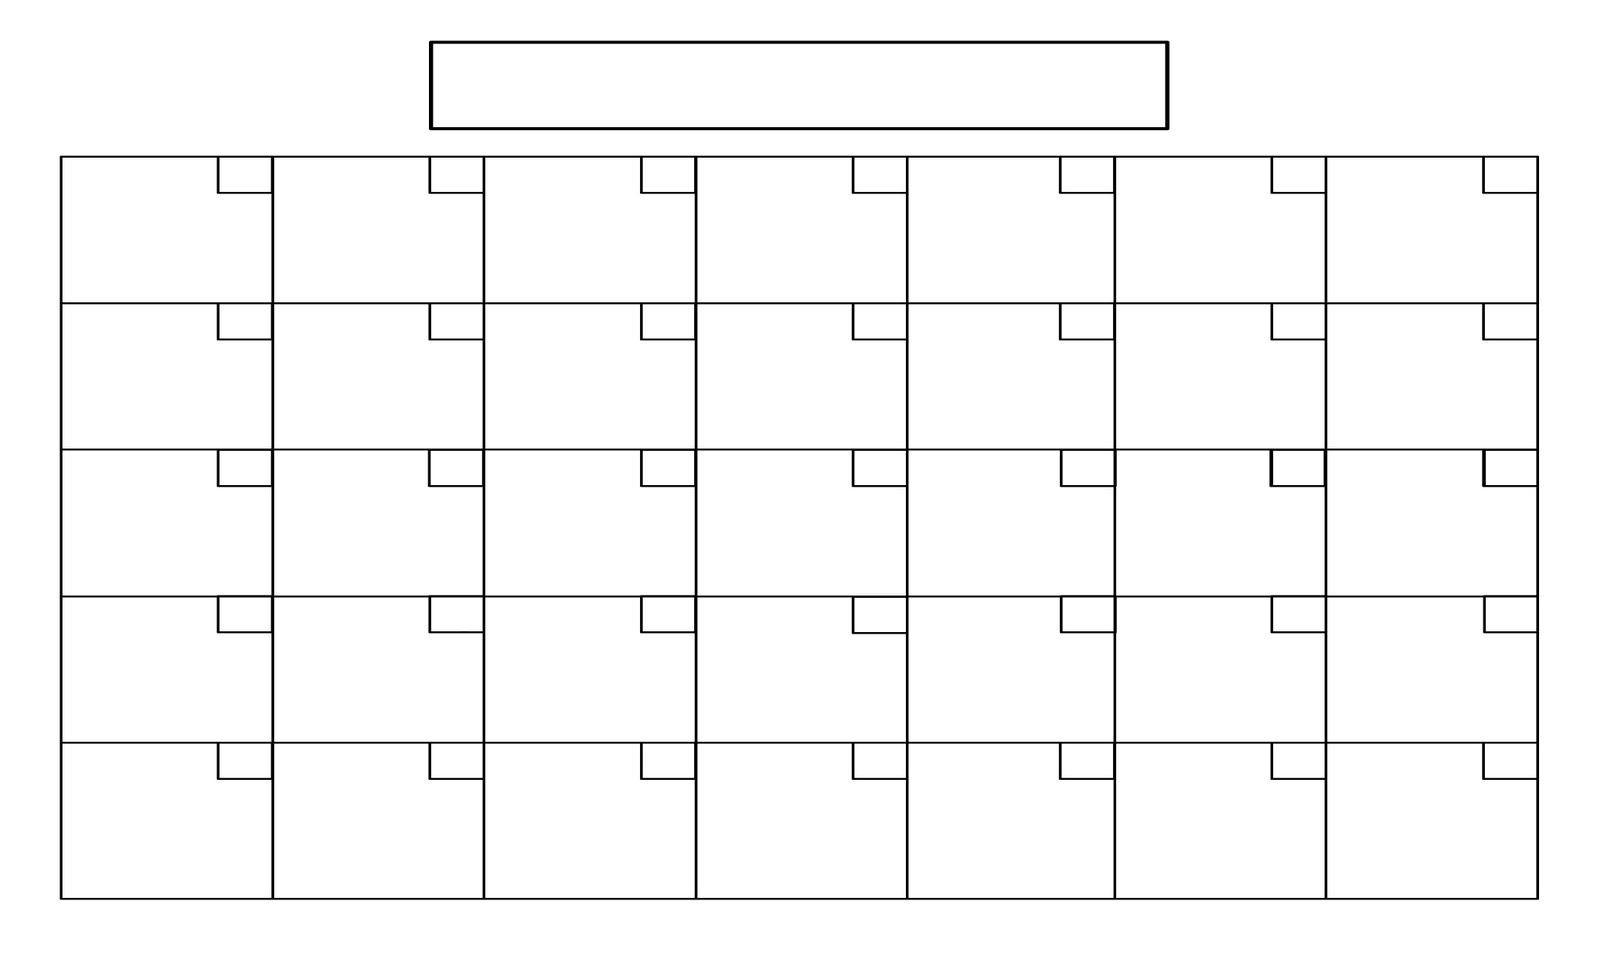 Printable+Full+Page+Blank+Calendar+Template | Blank Calendar  Printable Full Page Blank Calendar Template